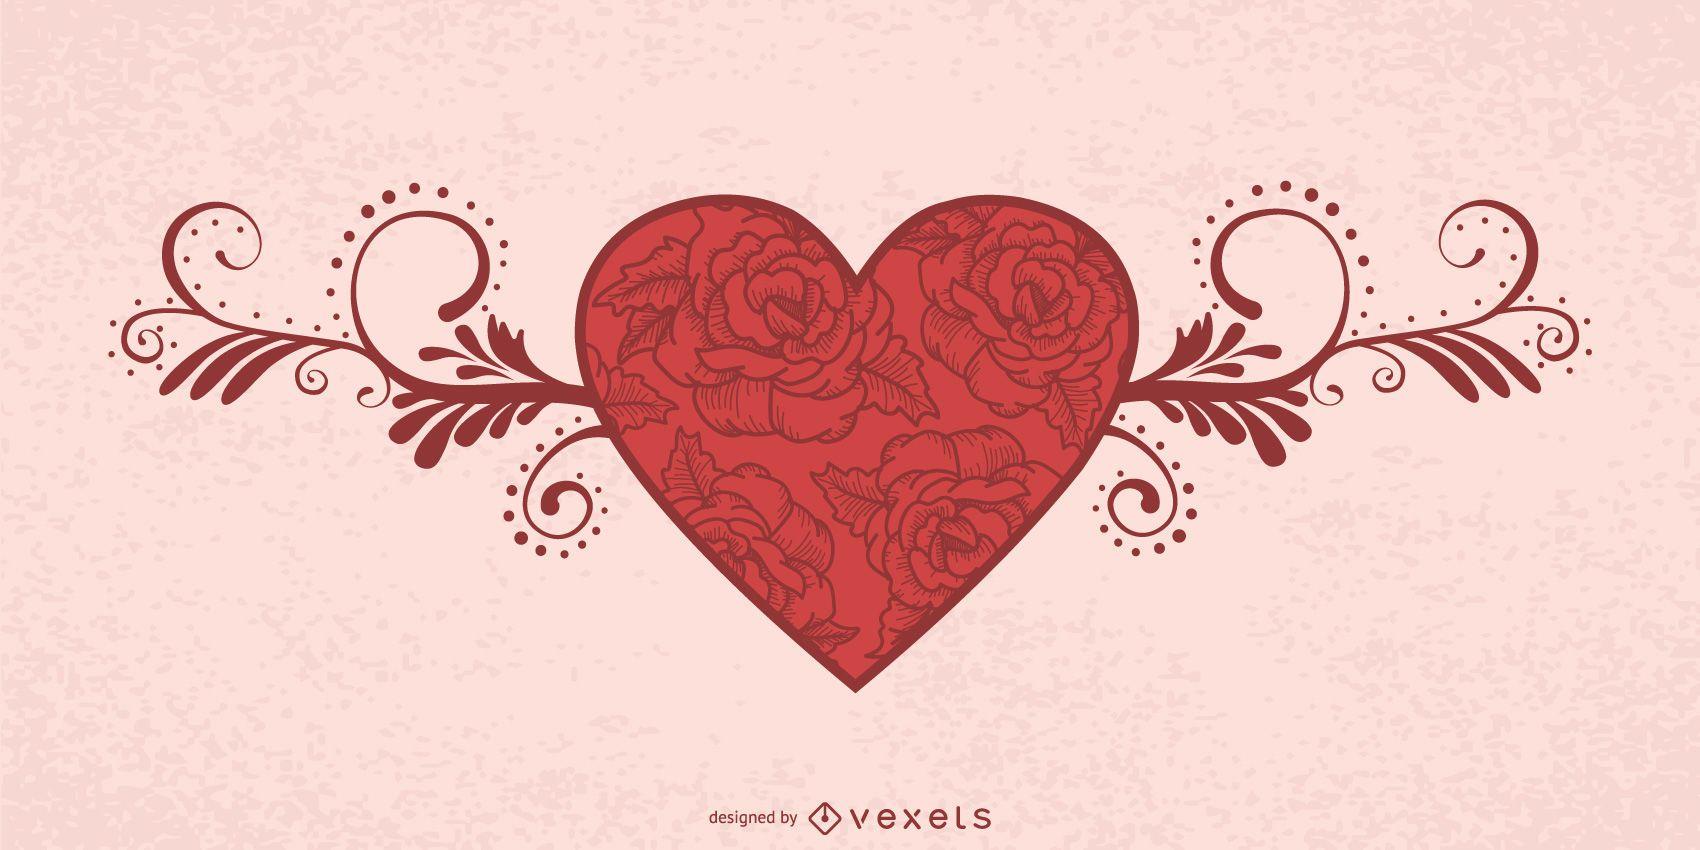 Tarjeta San Valentín Corazón Floral Decorativo